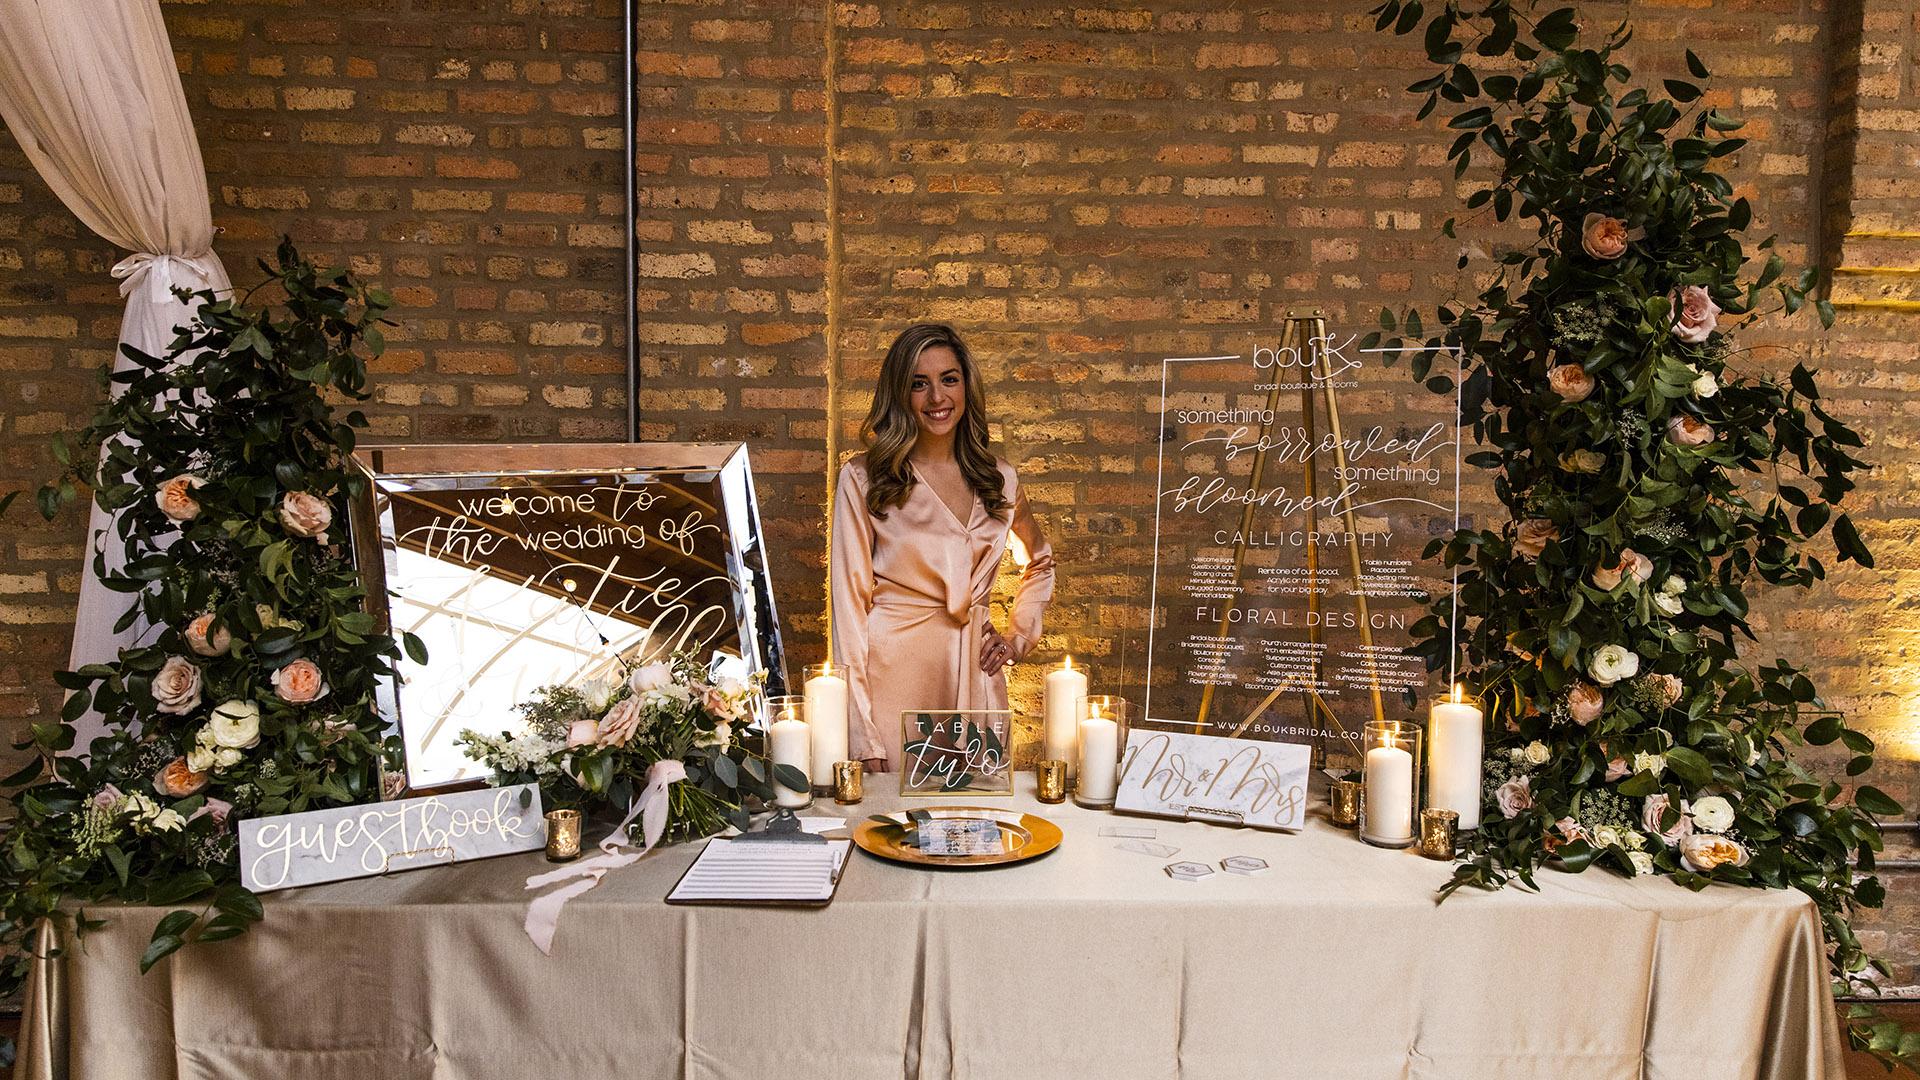 BouK Calligraphy & Florals - Kara Romuar-Mraz, Owner & Lead DesignerMobile: 847.809.2290Email: info@boukbridal.comWebsite: www.boukbridal.com